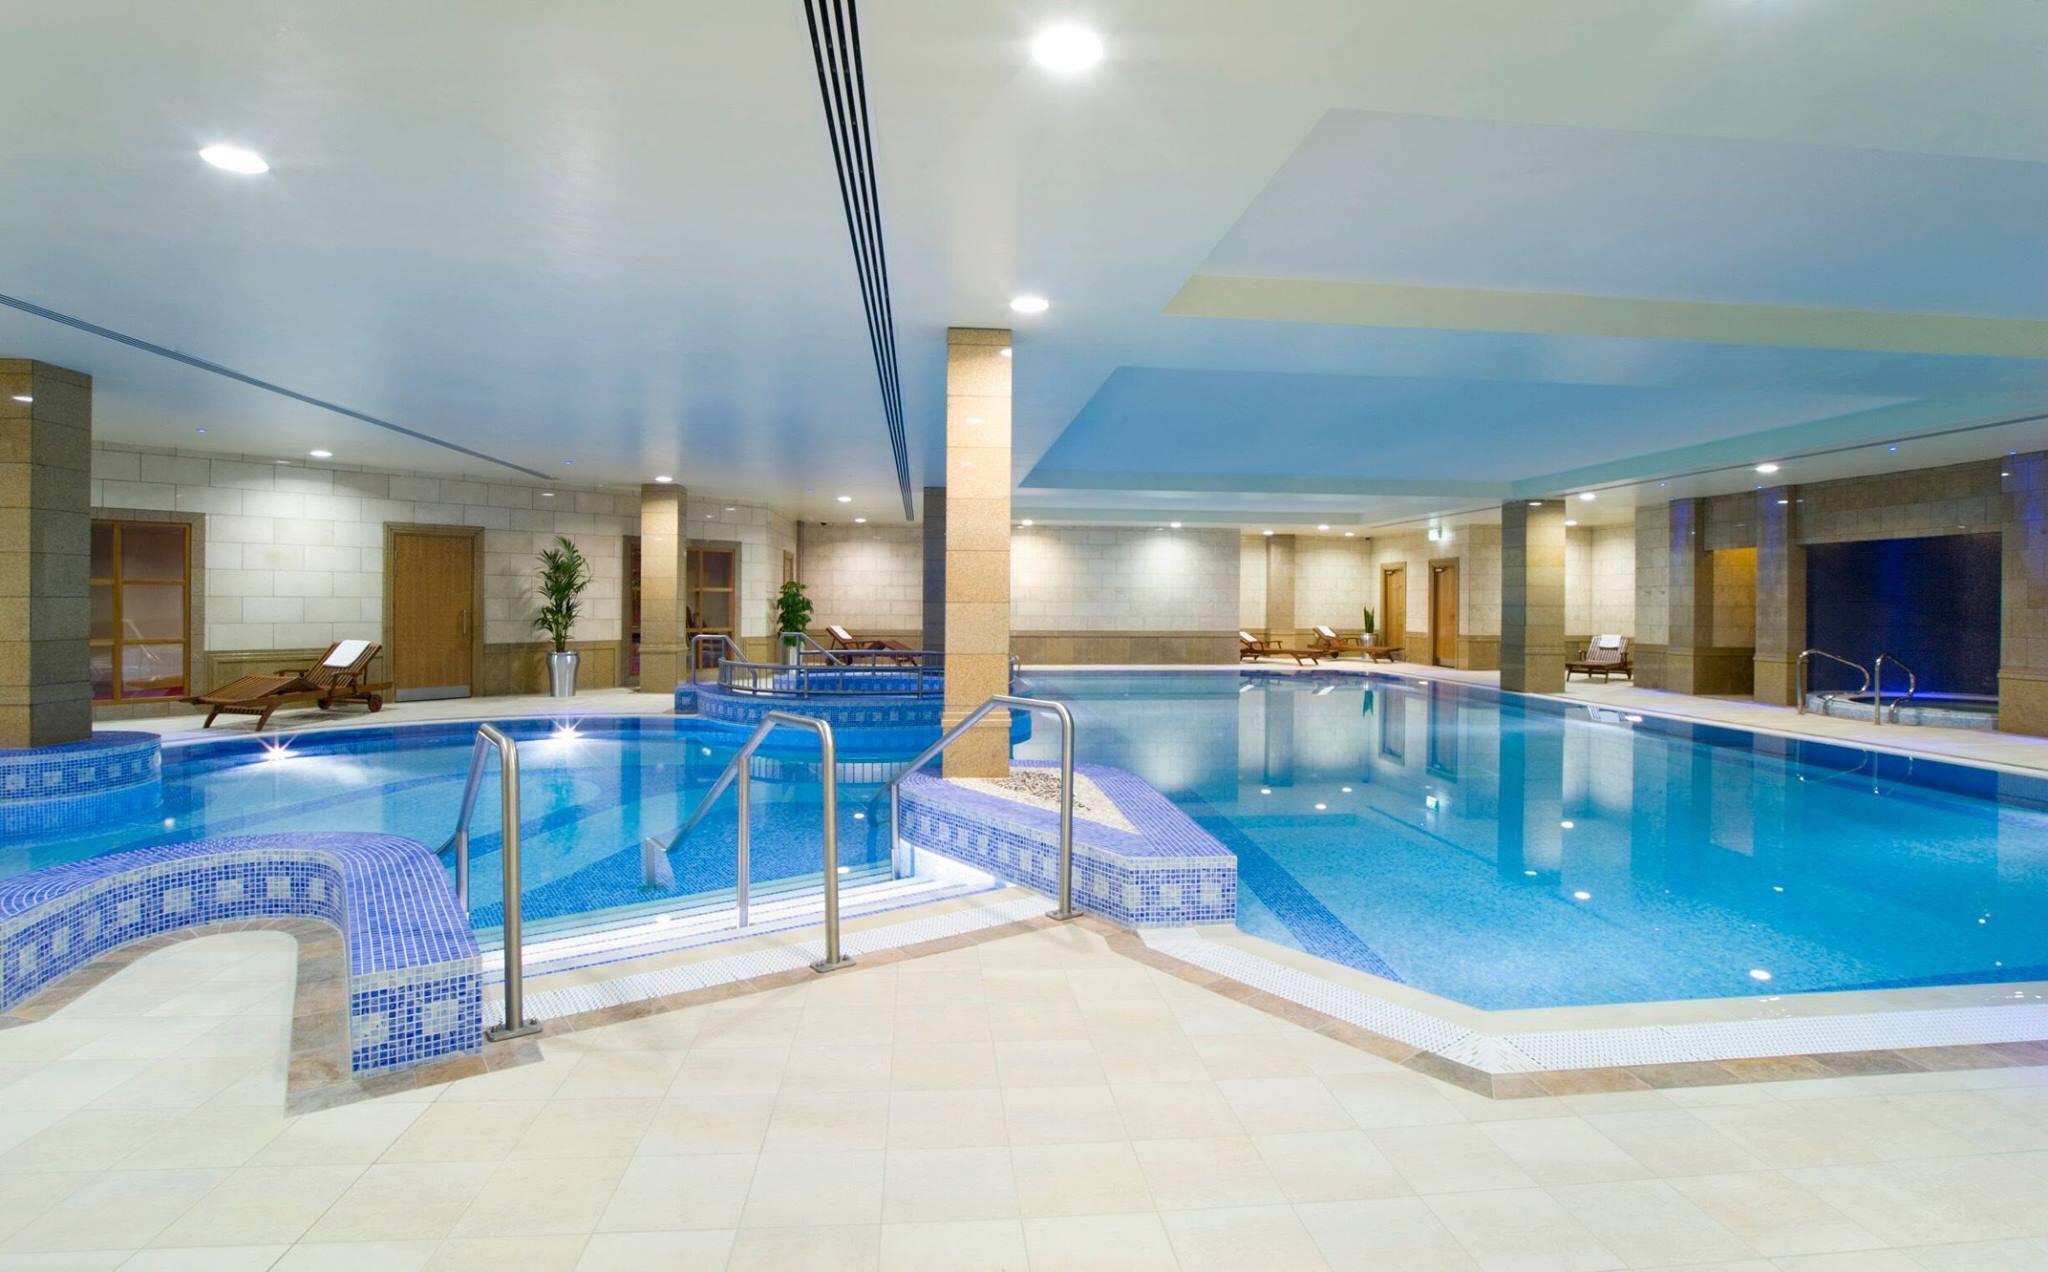 Bonnington Dublin Hotel indoor pool in luxury dublin hotel spas area